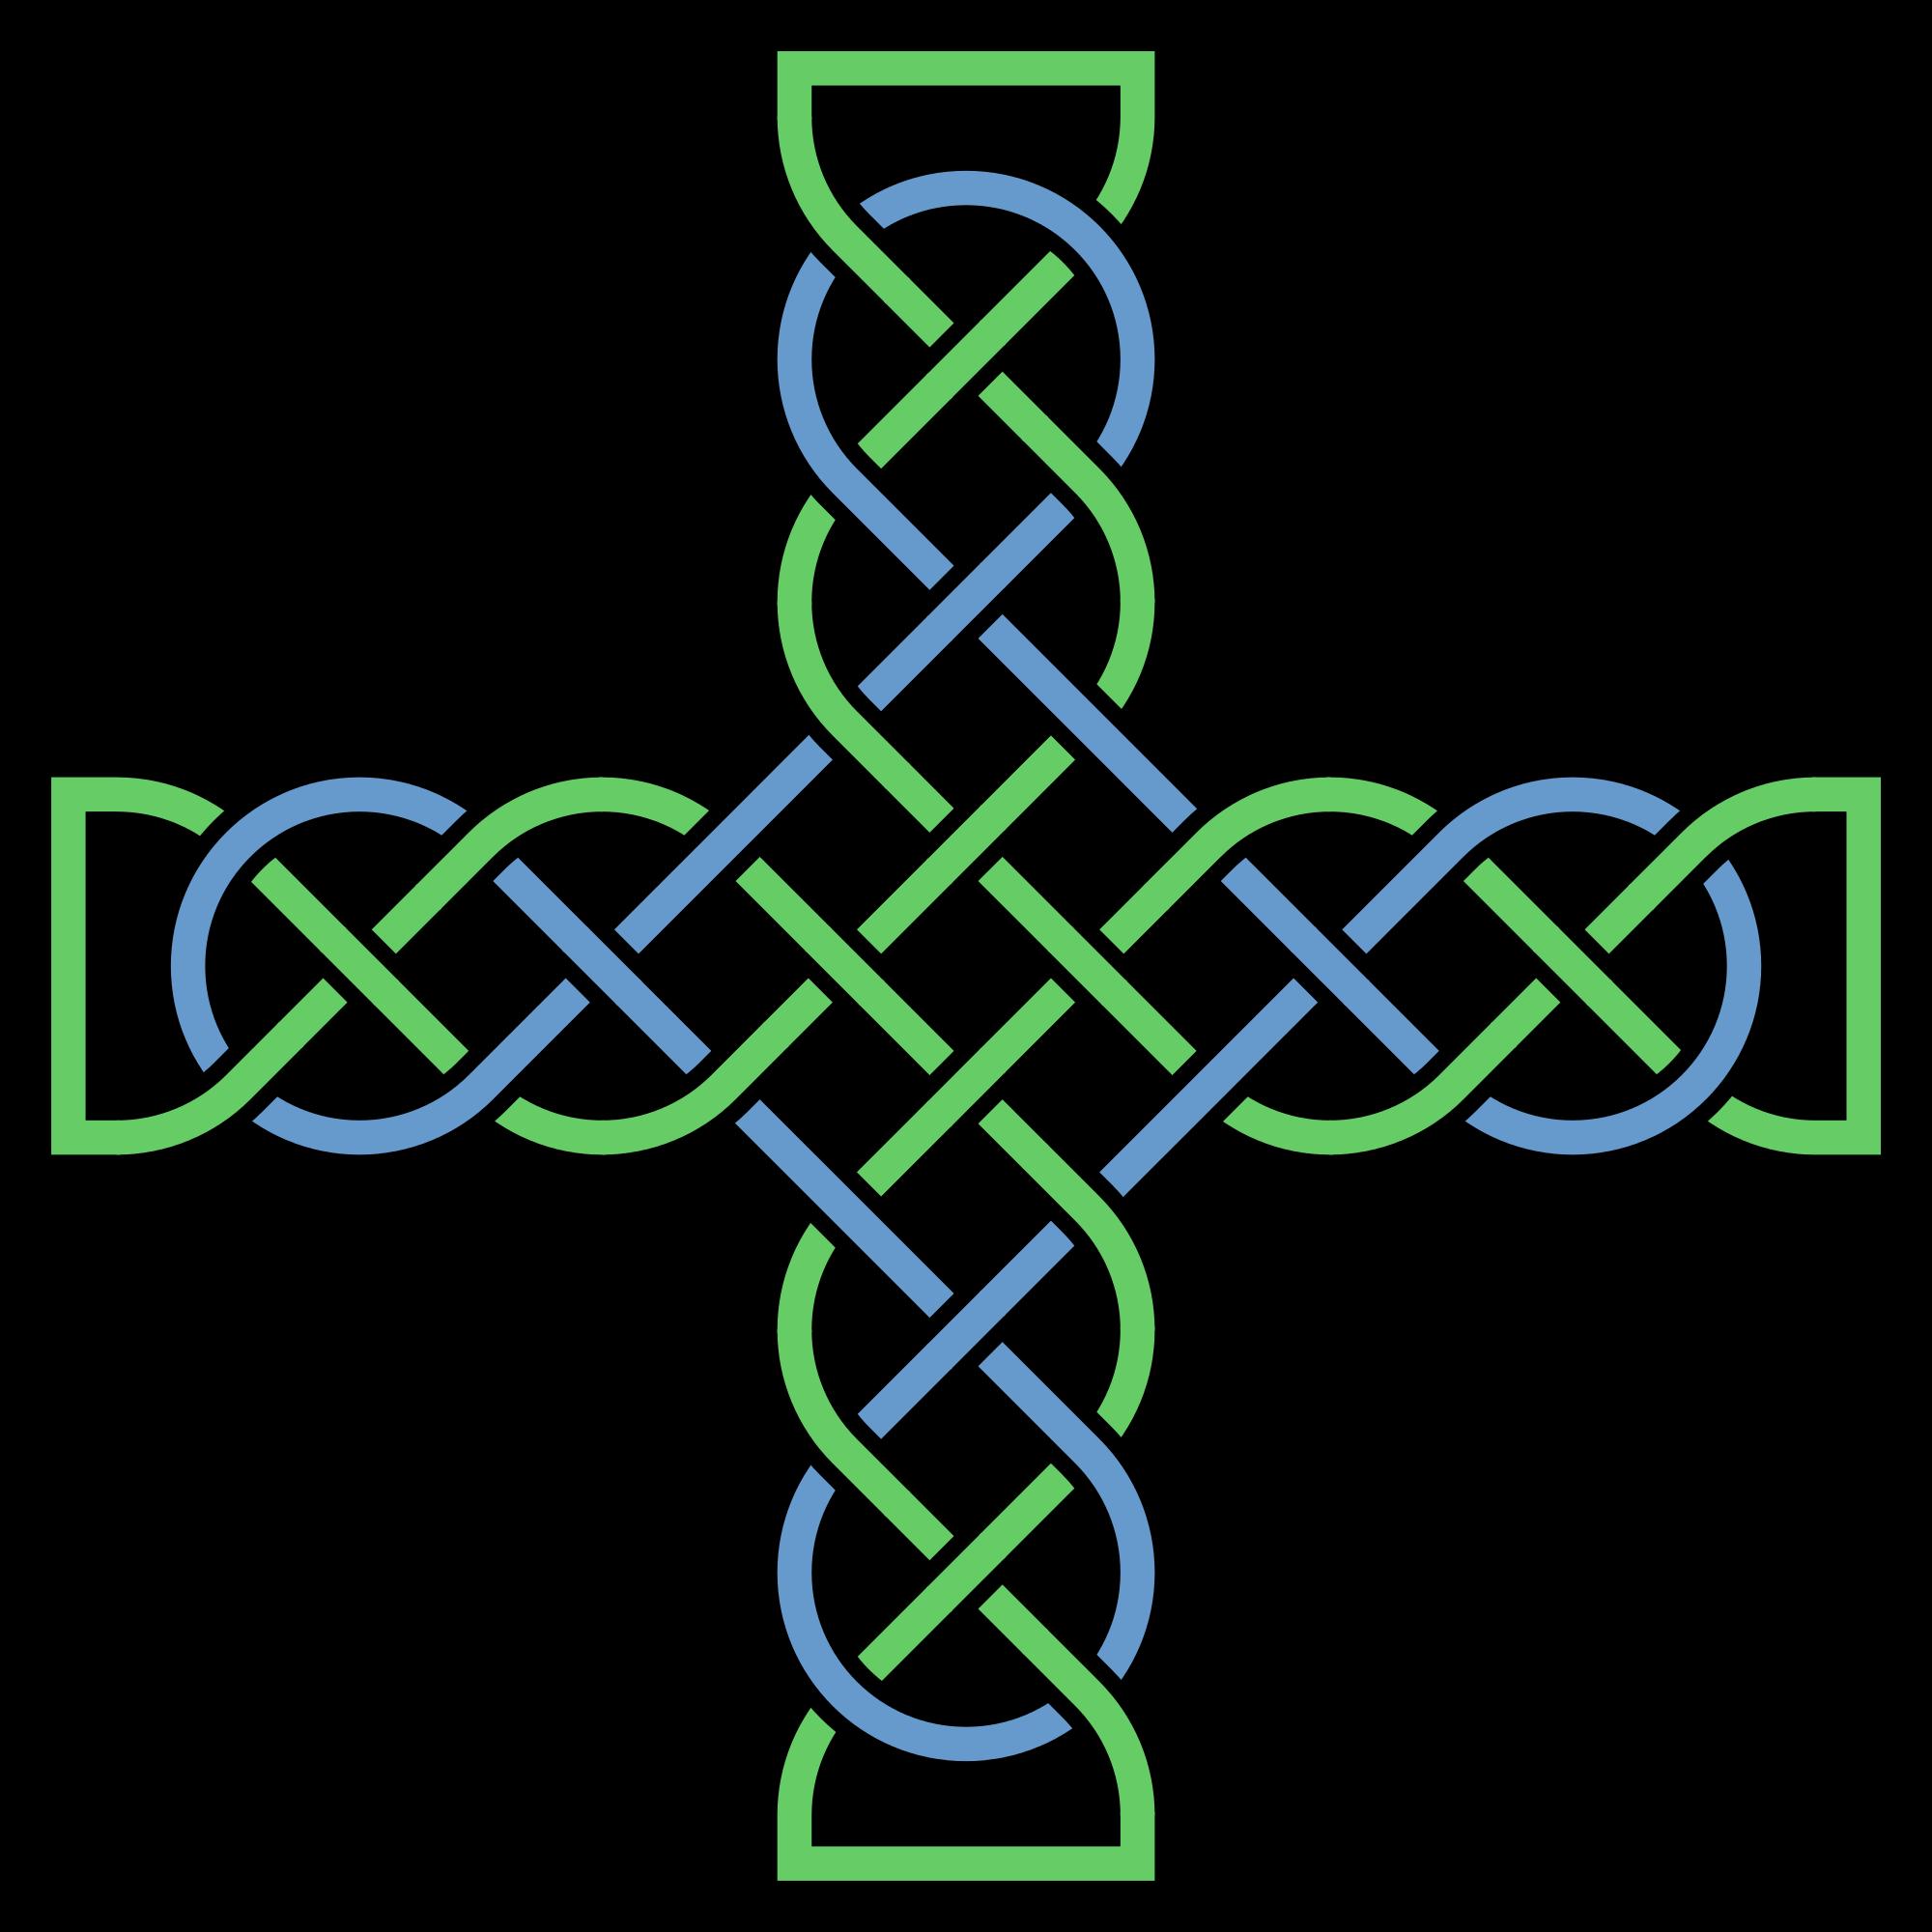 Irish cross clipart image black and white download File:Knotwork-cross-multicolored.svg - Wikimedia Commons image black and white download